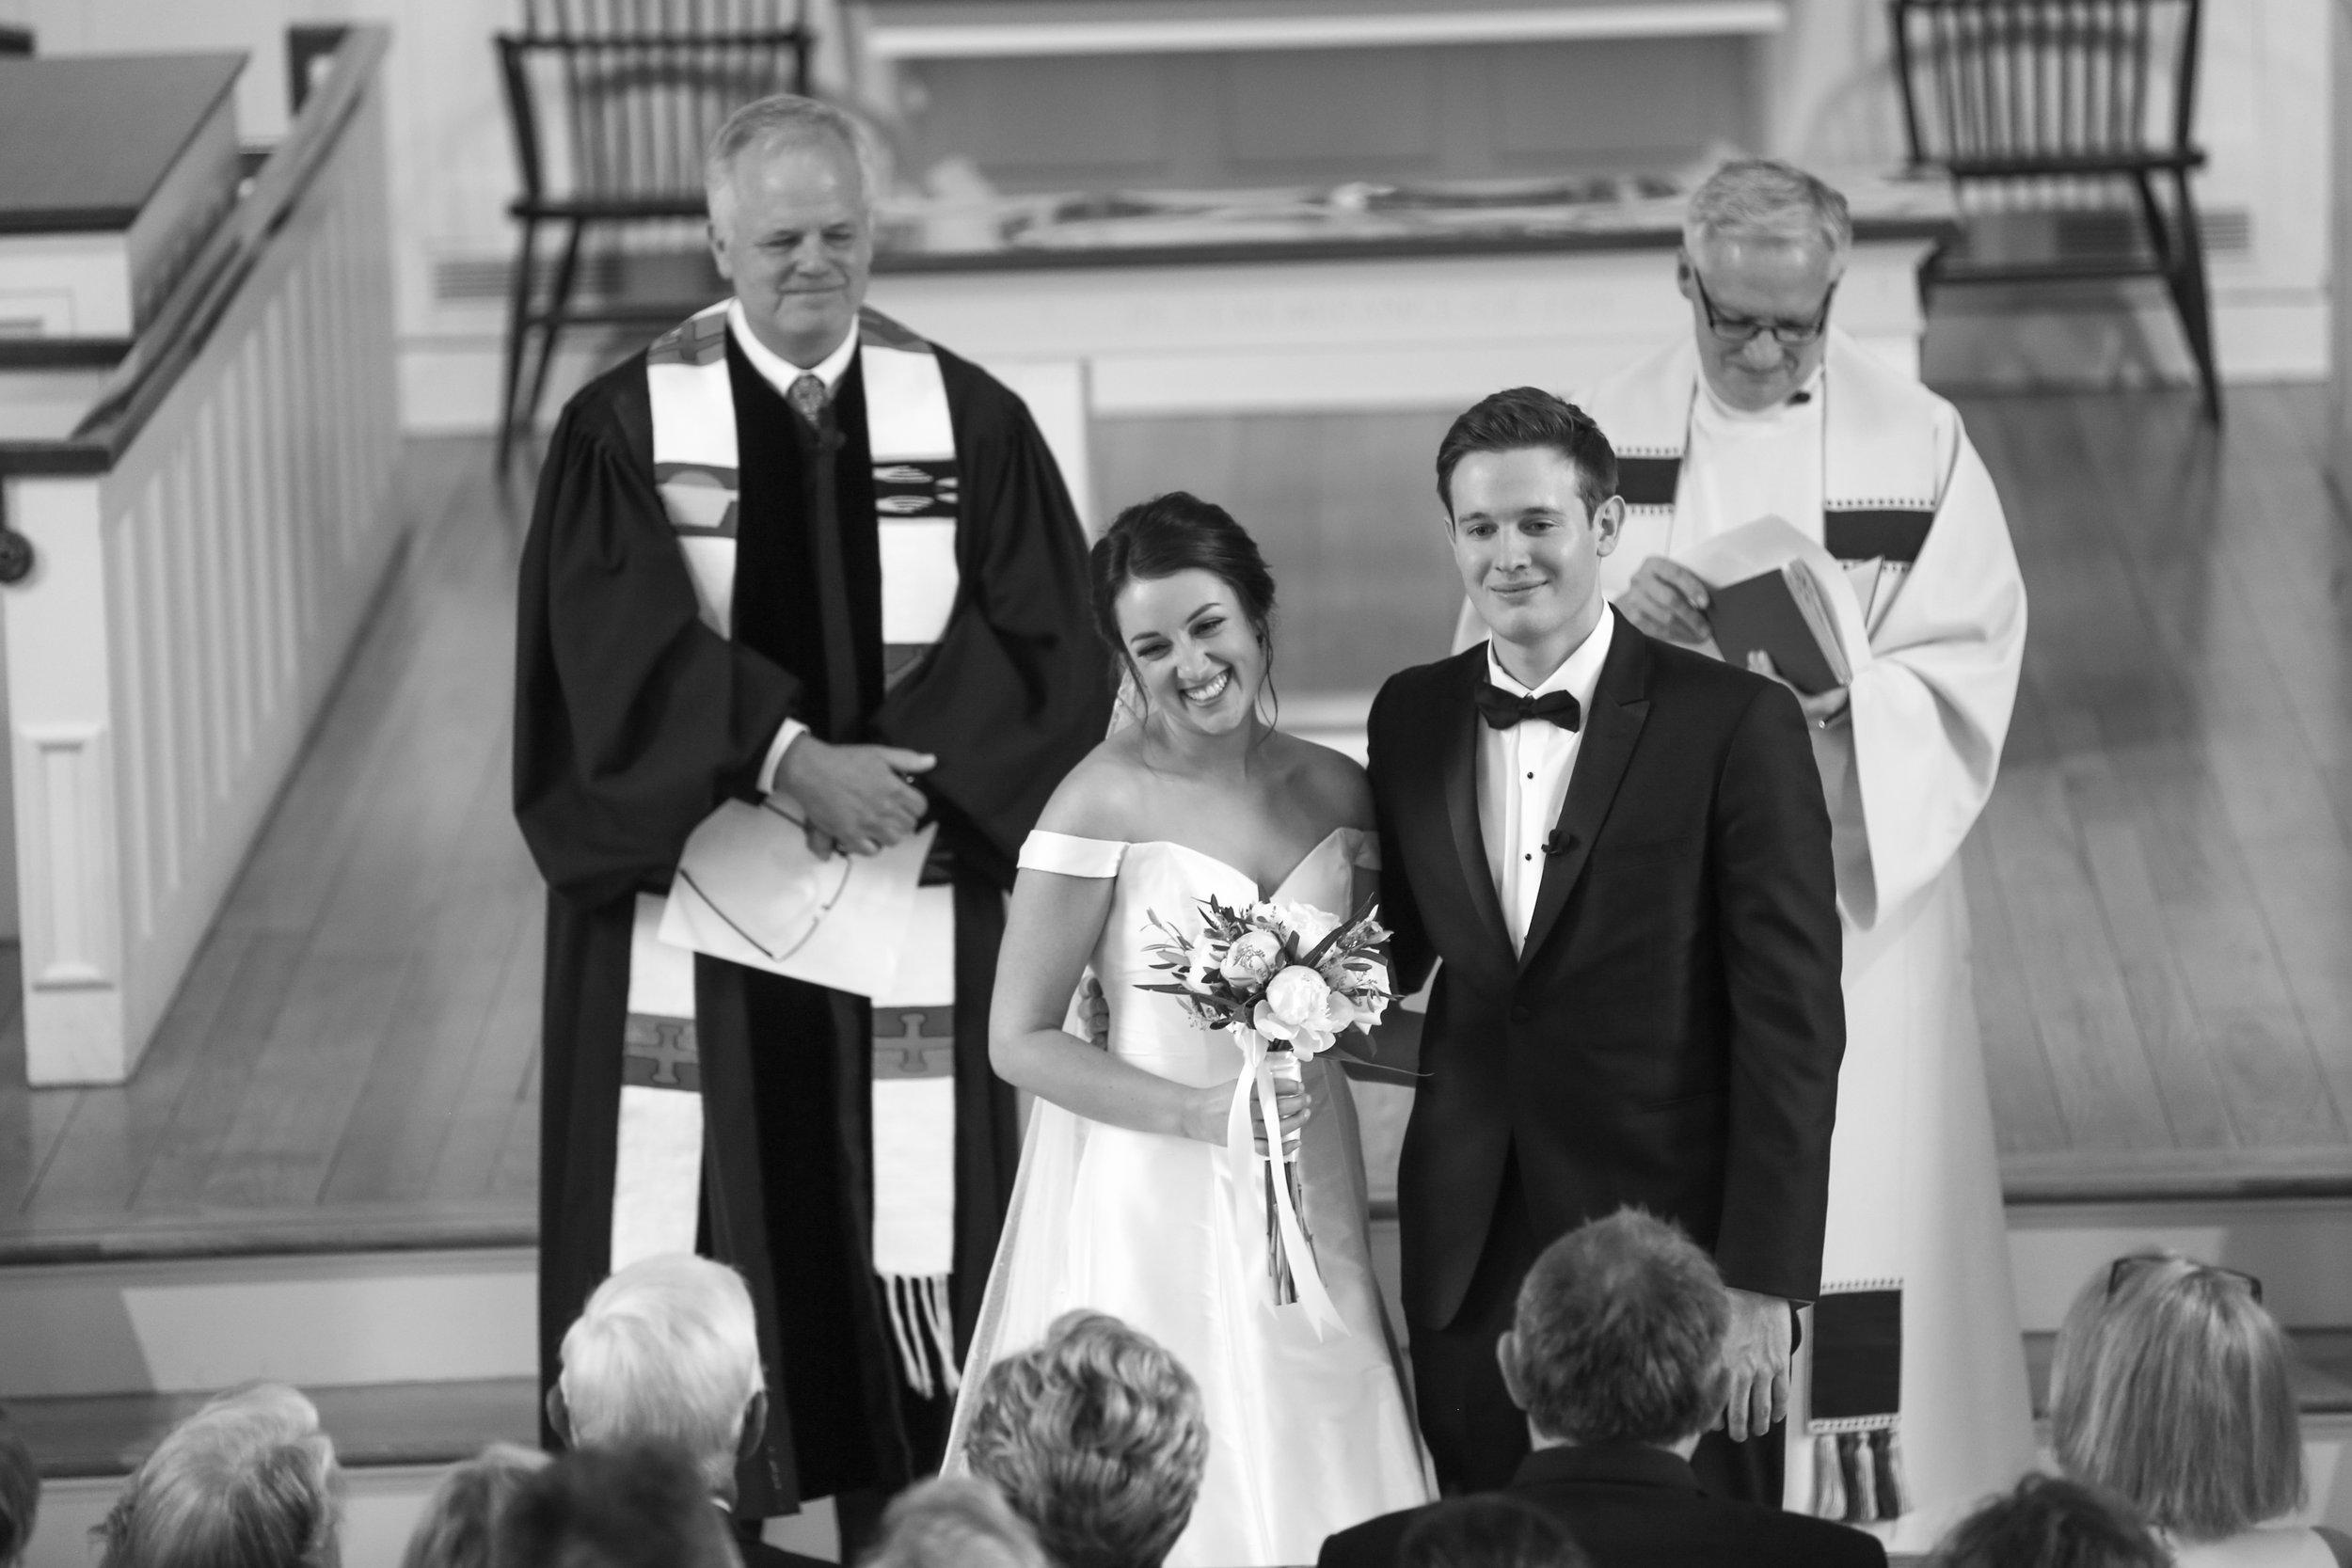 Jeremie_Barlow_Photography_Steffen_Sudyam_wedding_2018-462.jpg